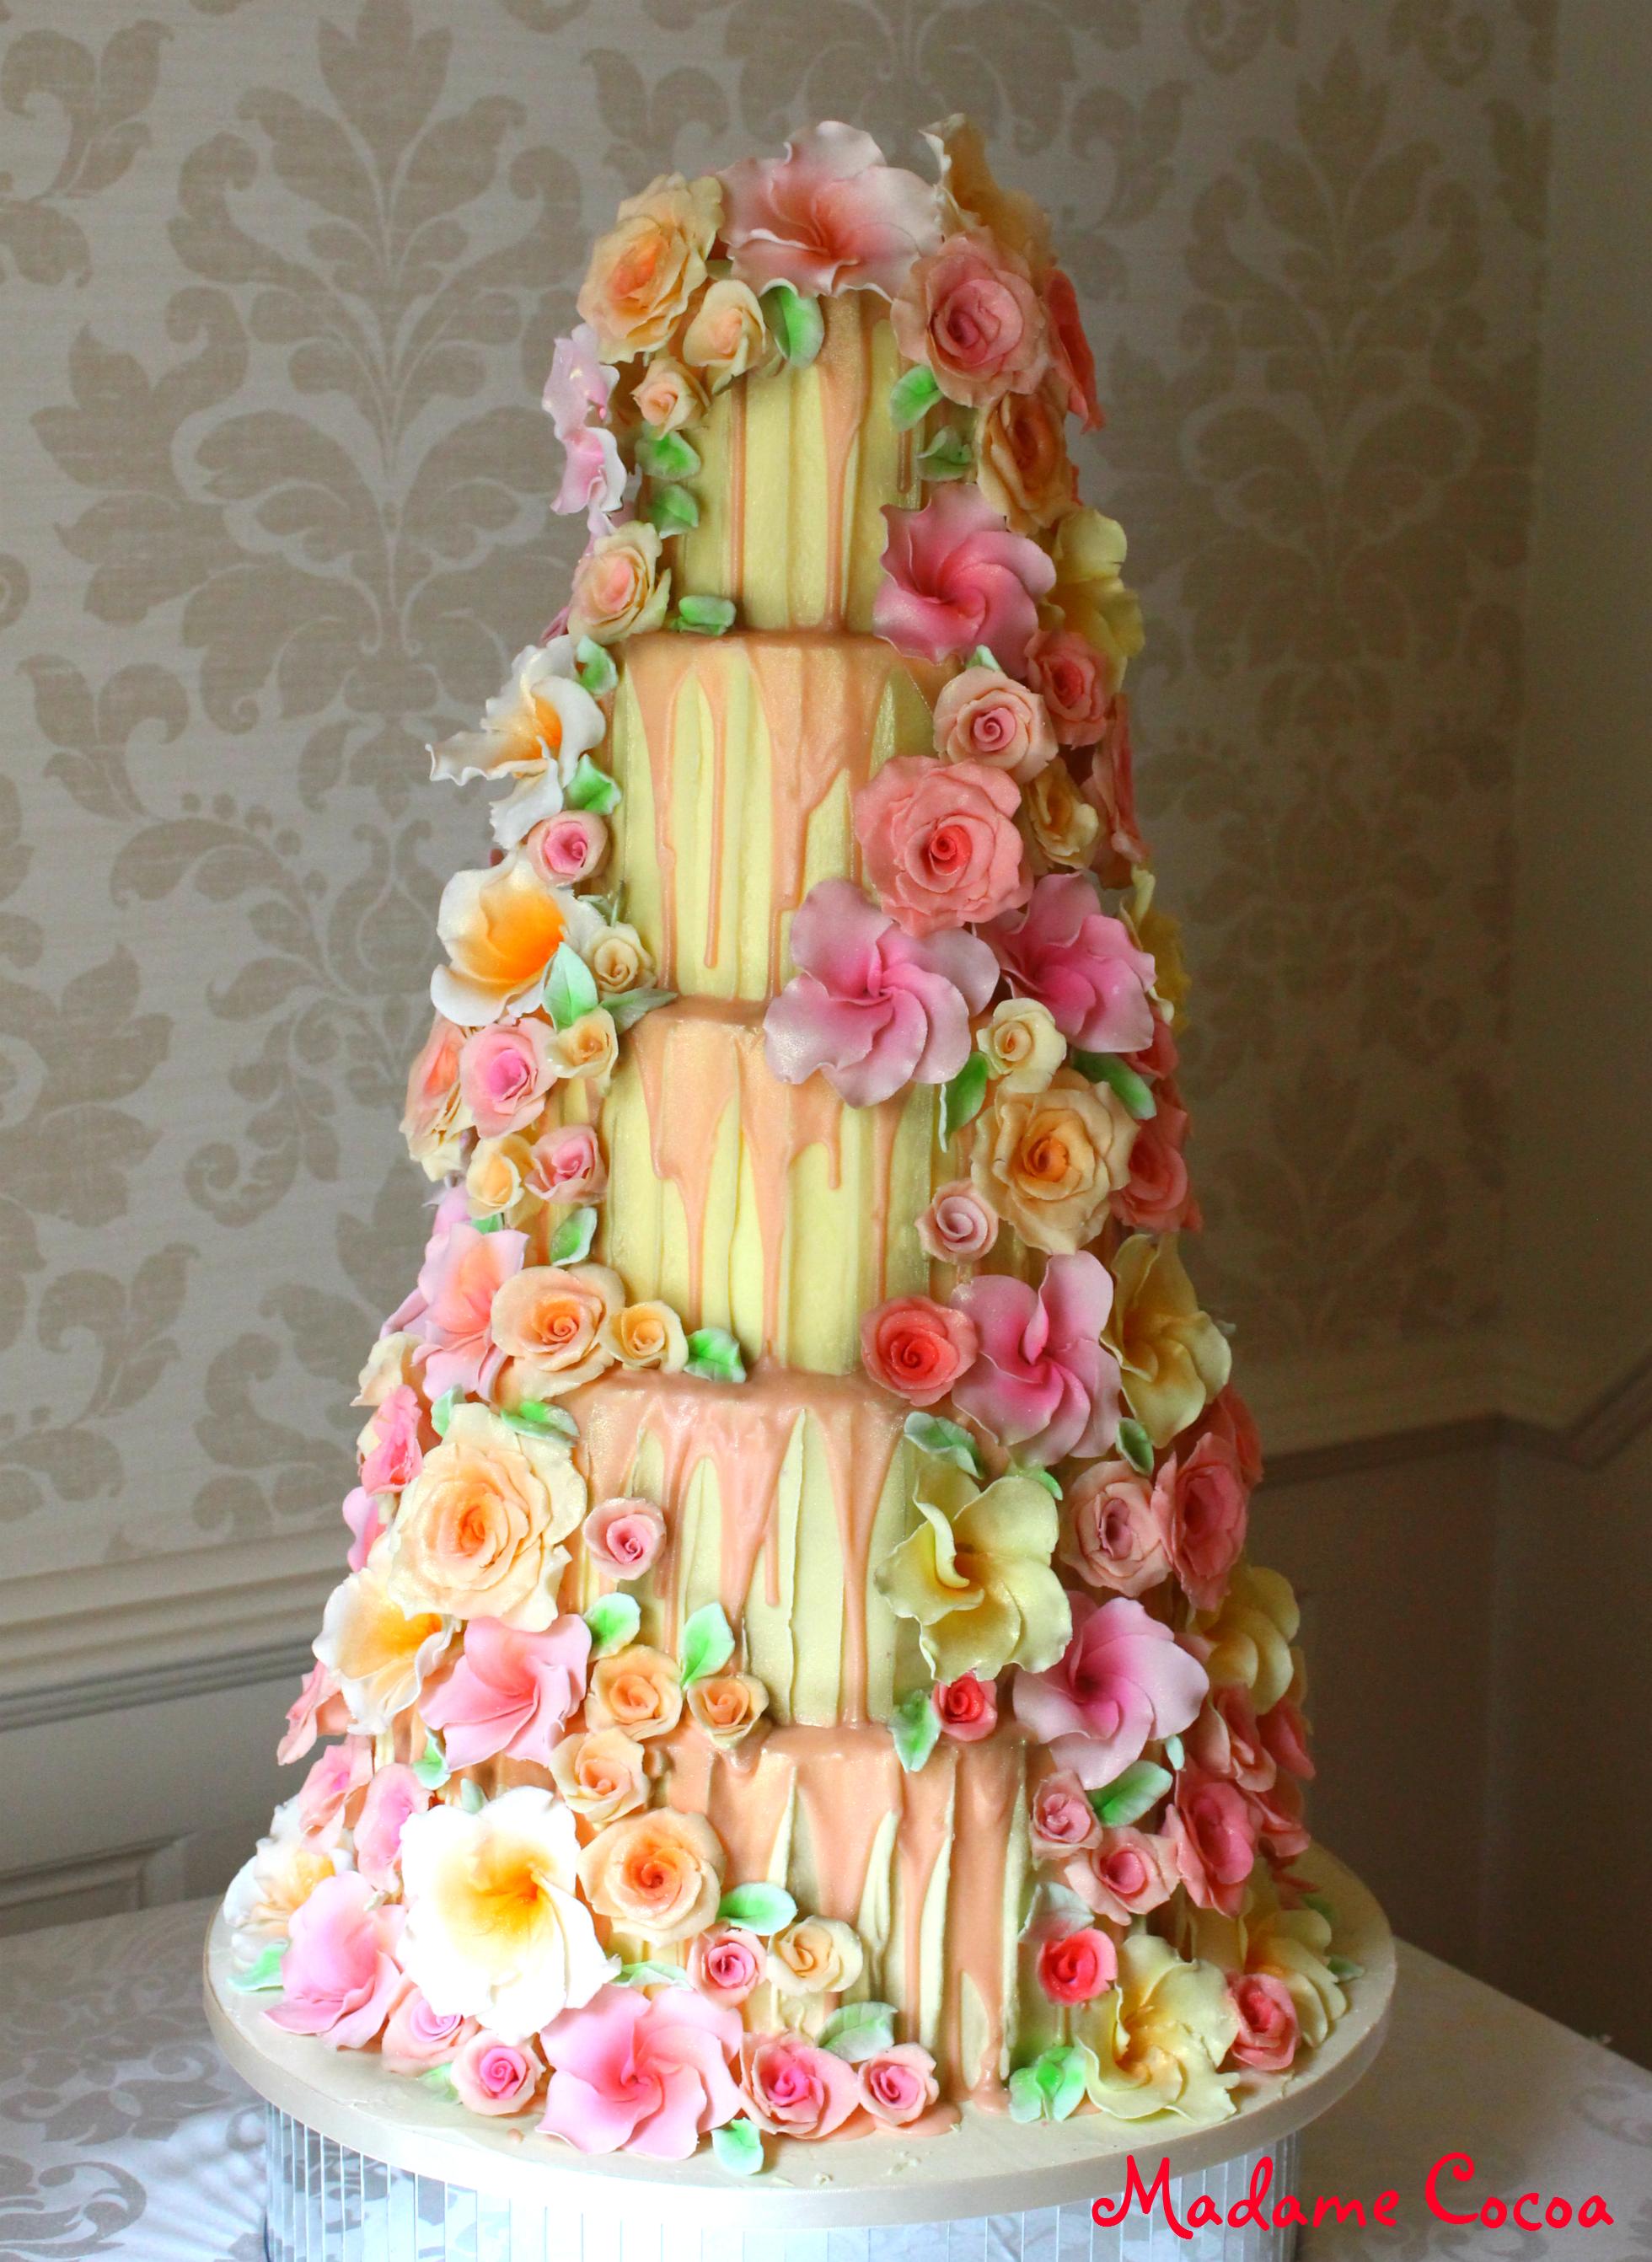 Chocolate floral wedding cake